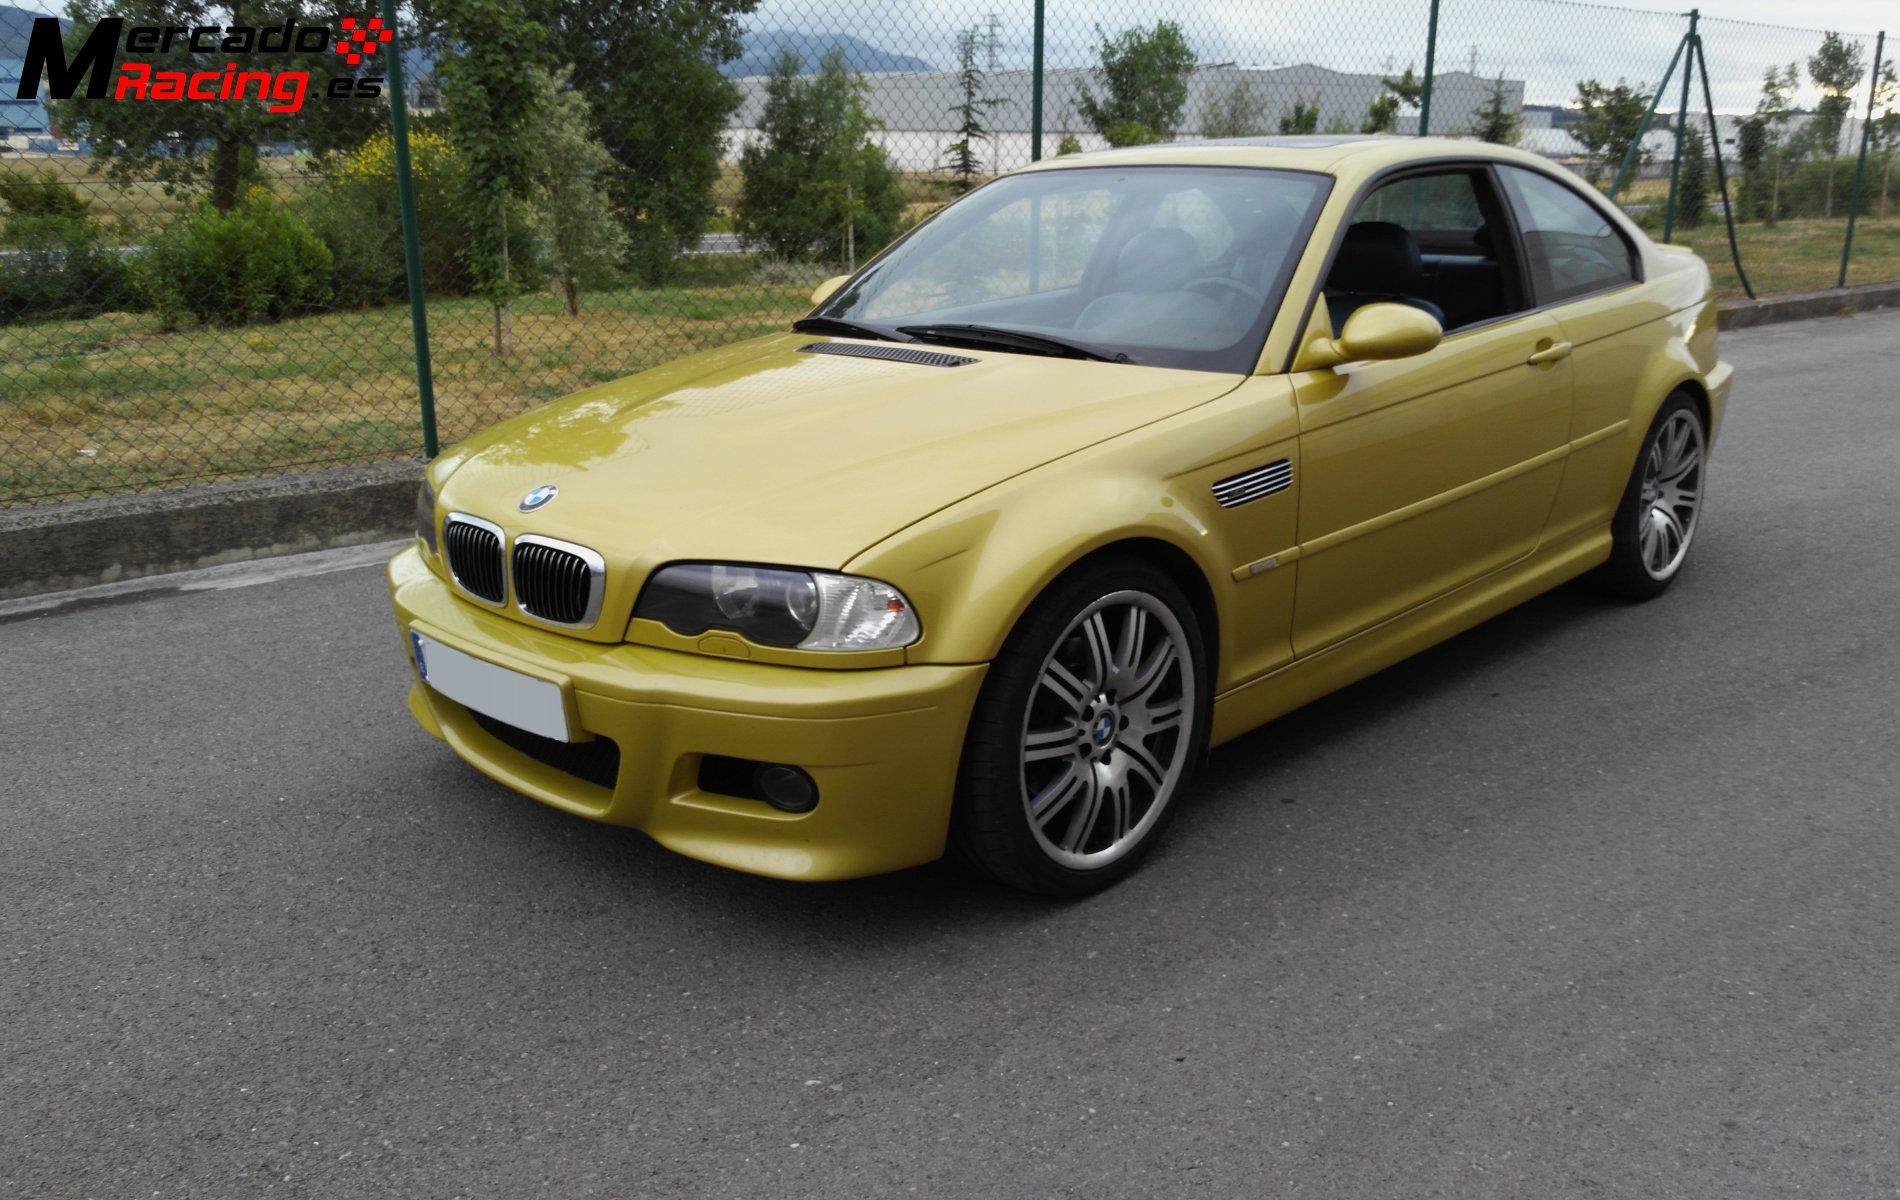 Vendo Bmw M3 E46 343cv Smg Ii Nacional Yellow Phoenix